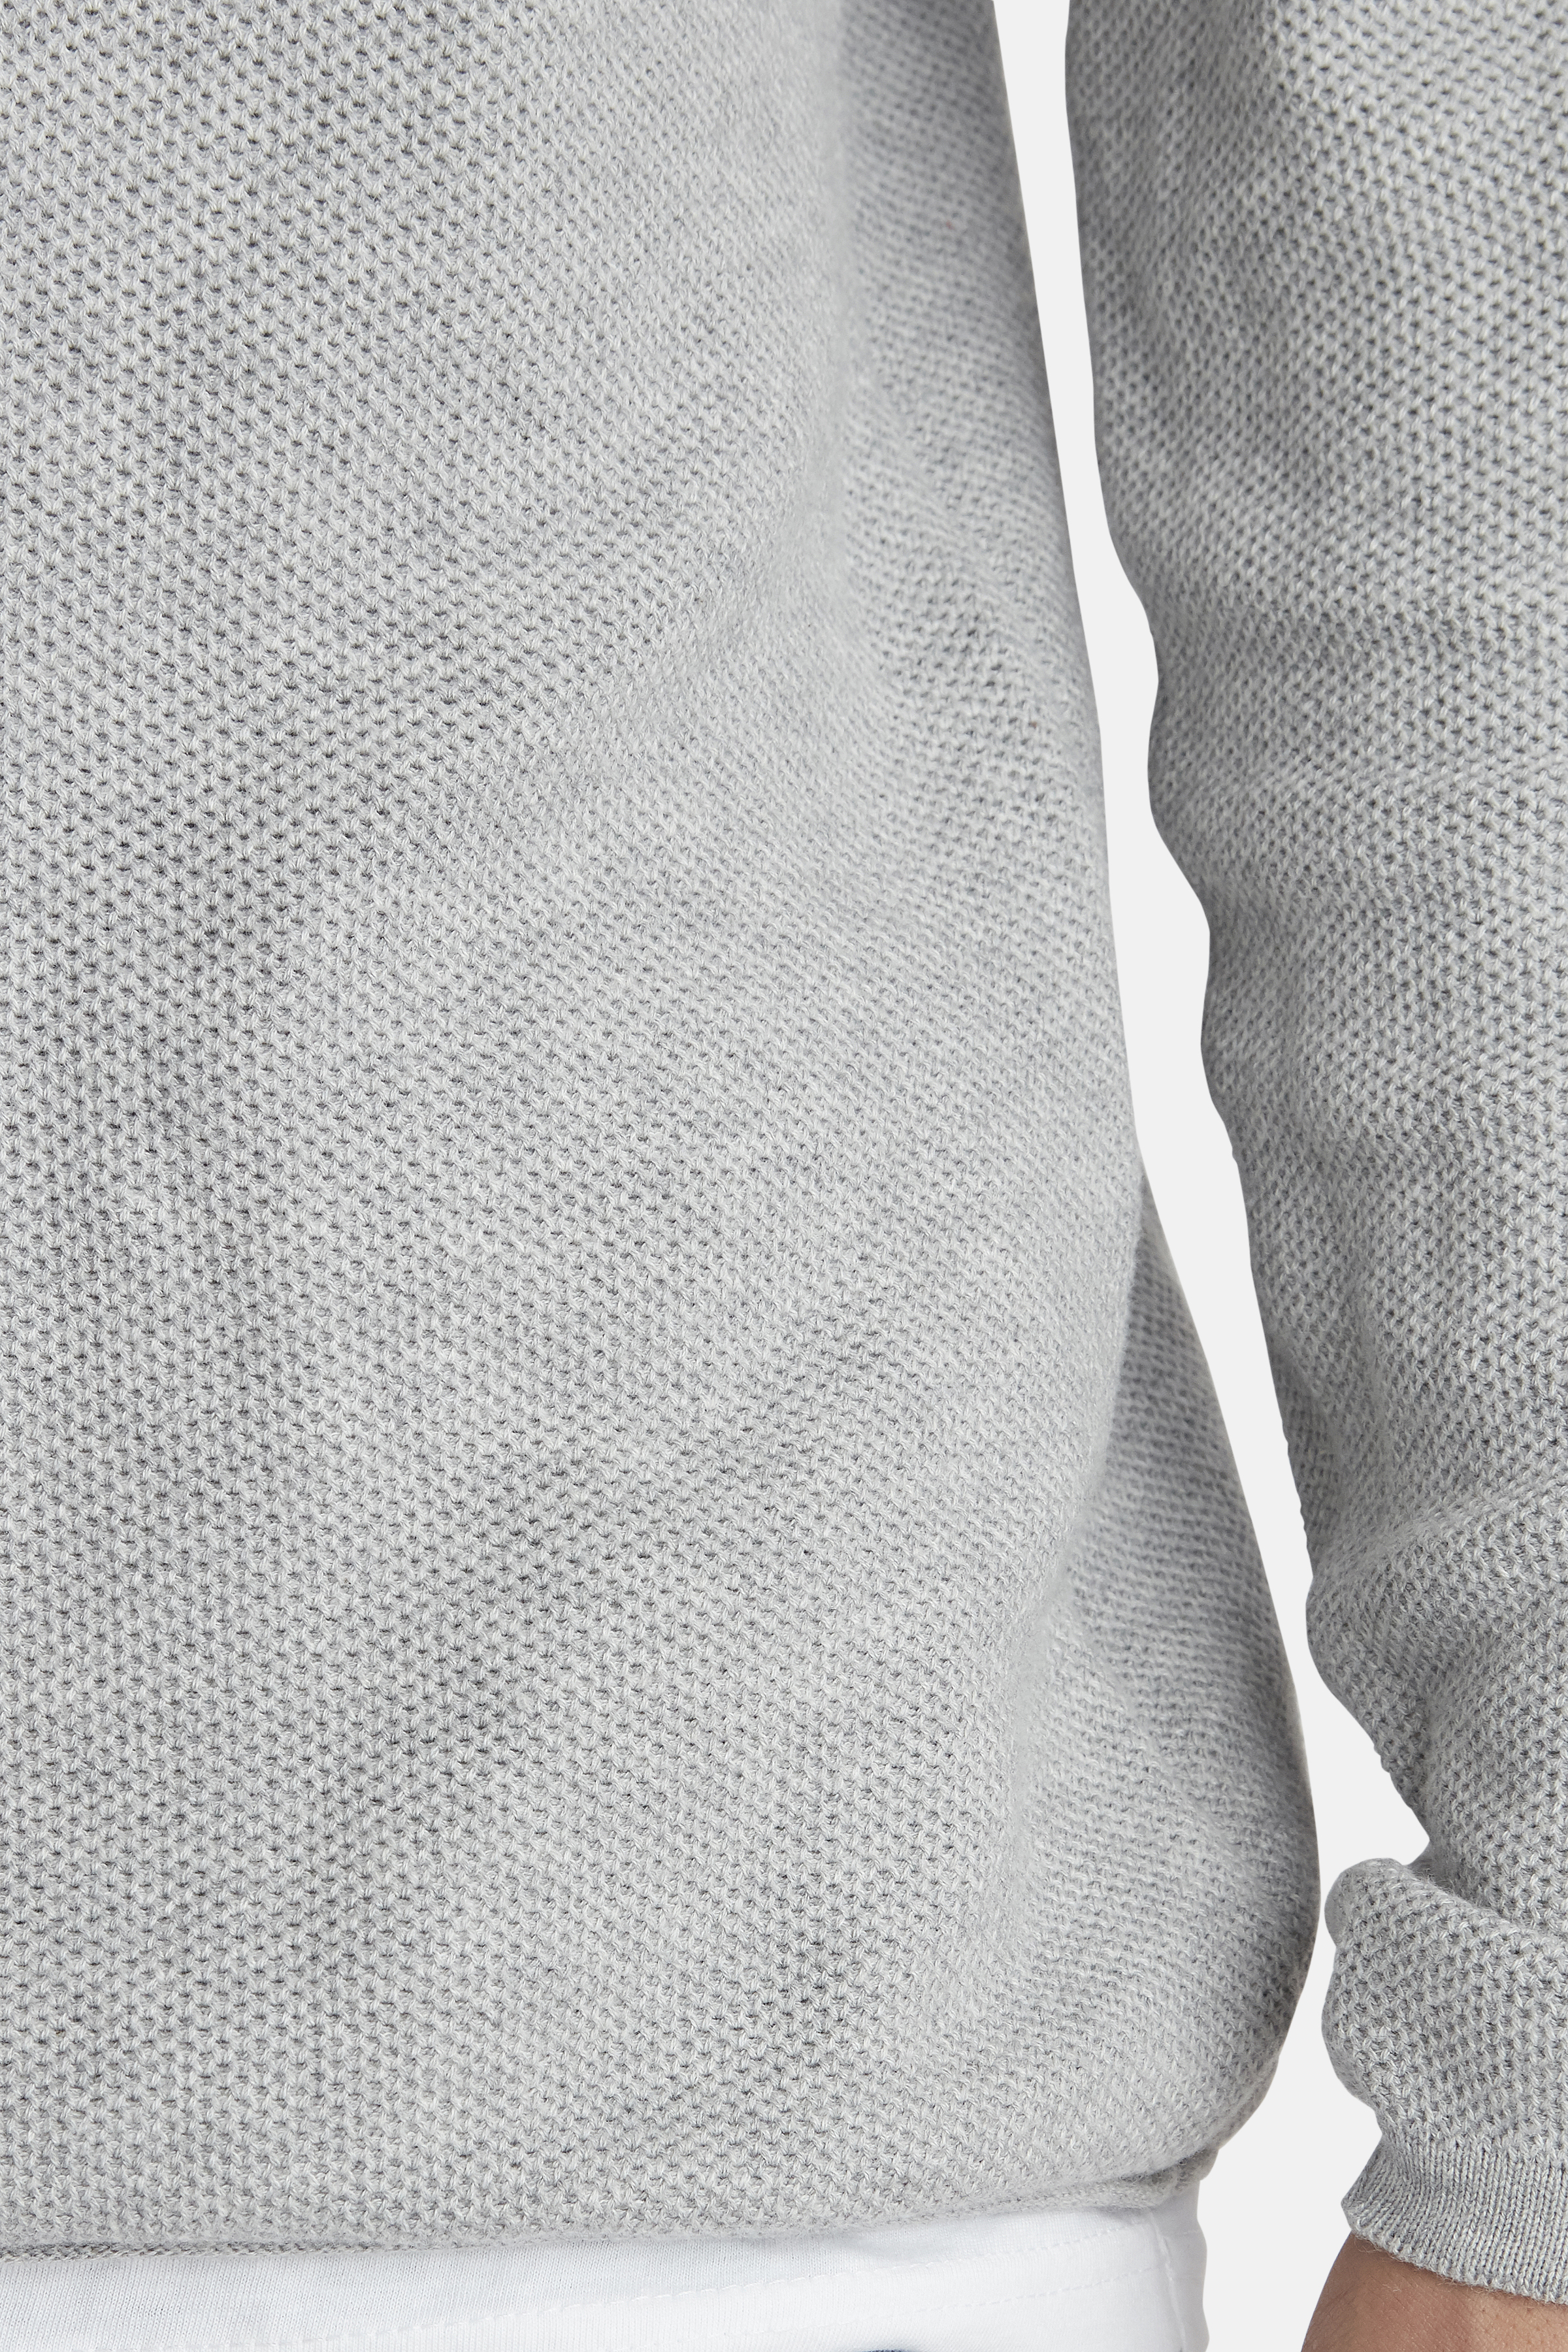 Stone mix Knitted pullover fra Blend He – Køb Stone mix Knitted pullover fra str. S-XXL her